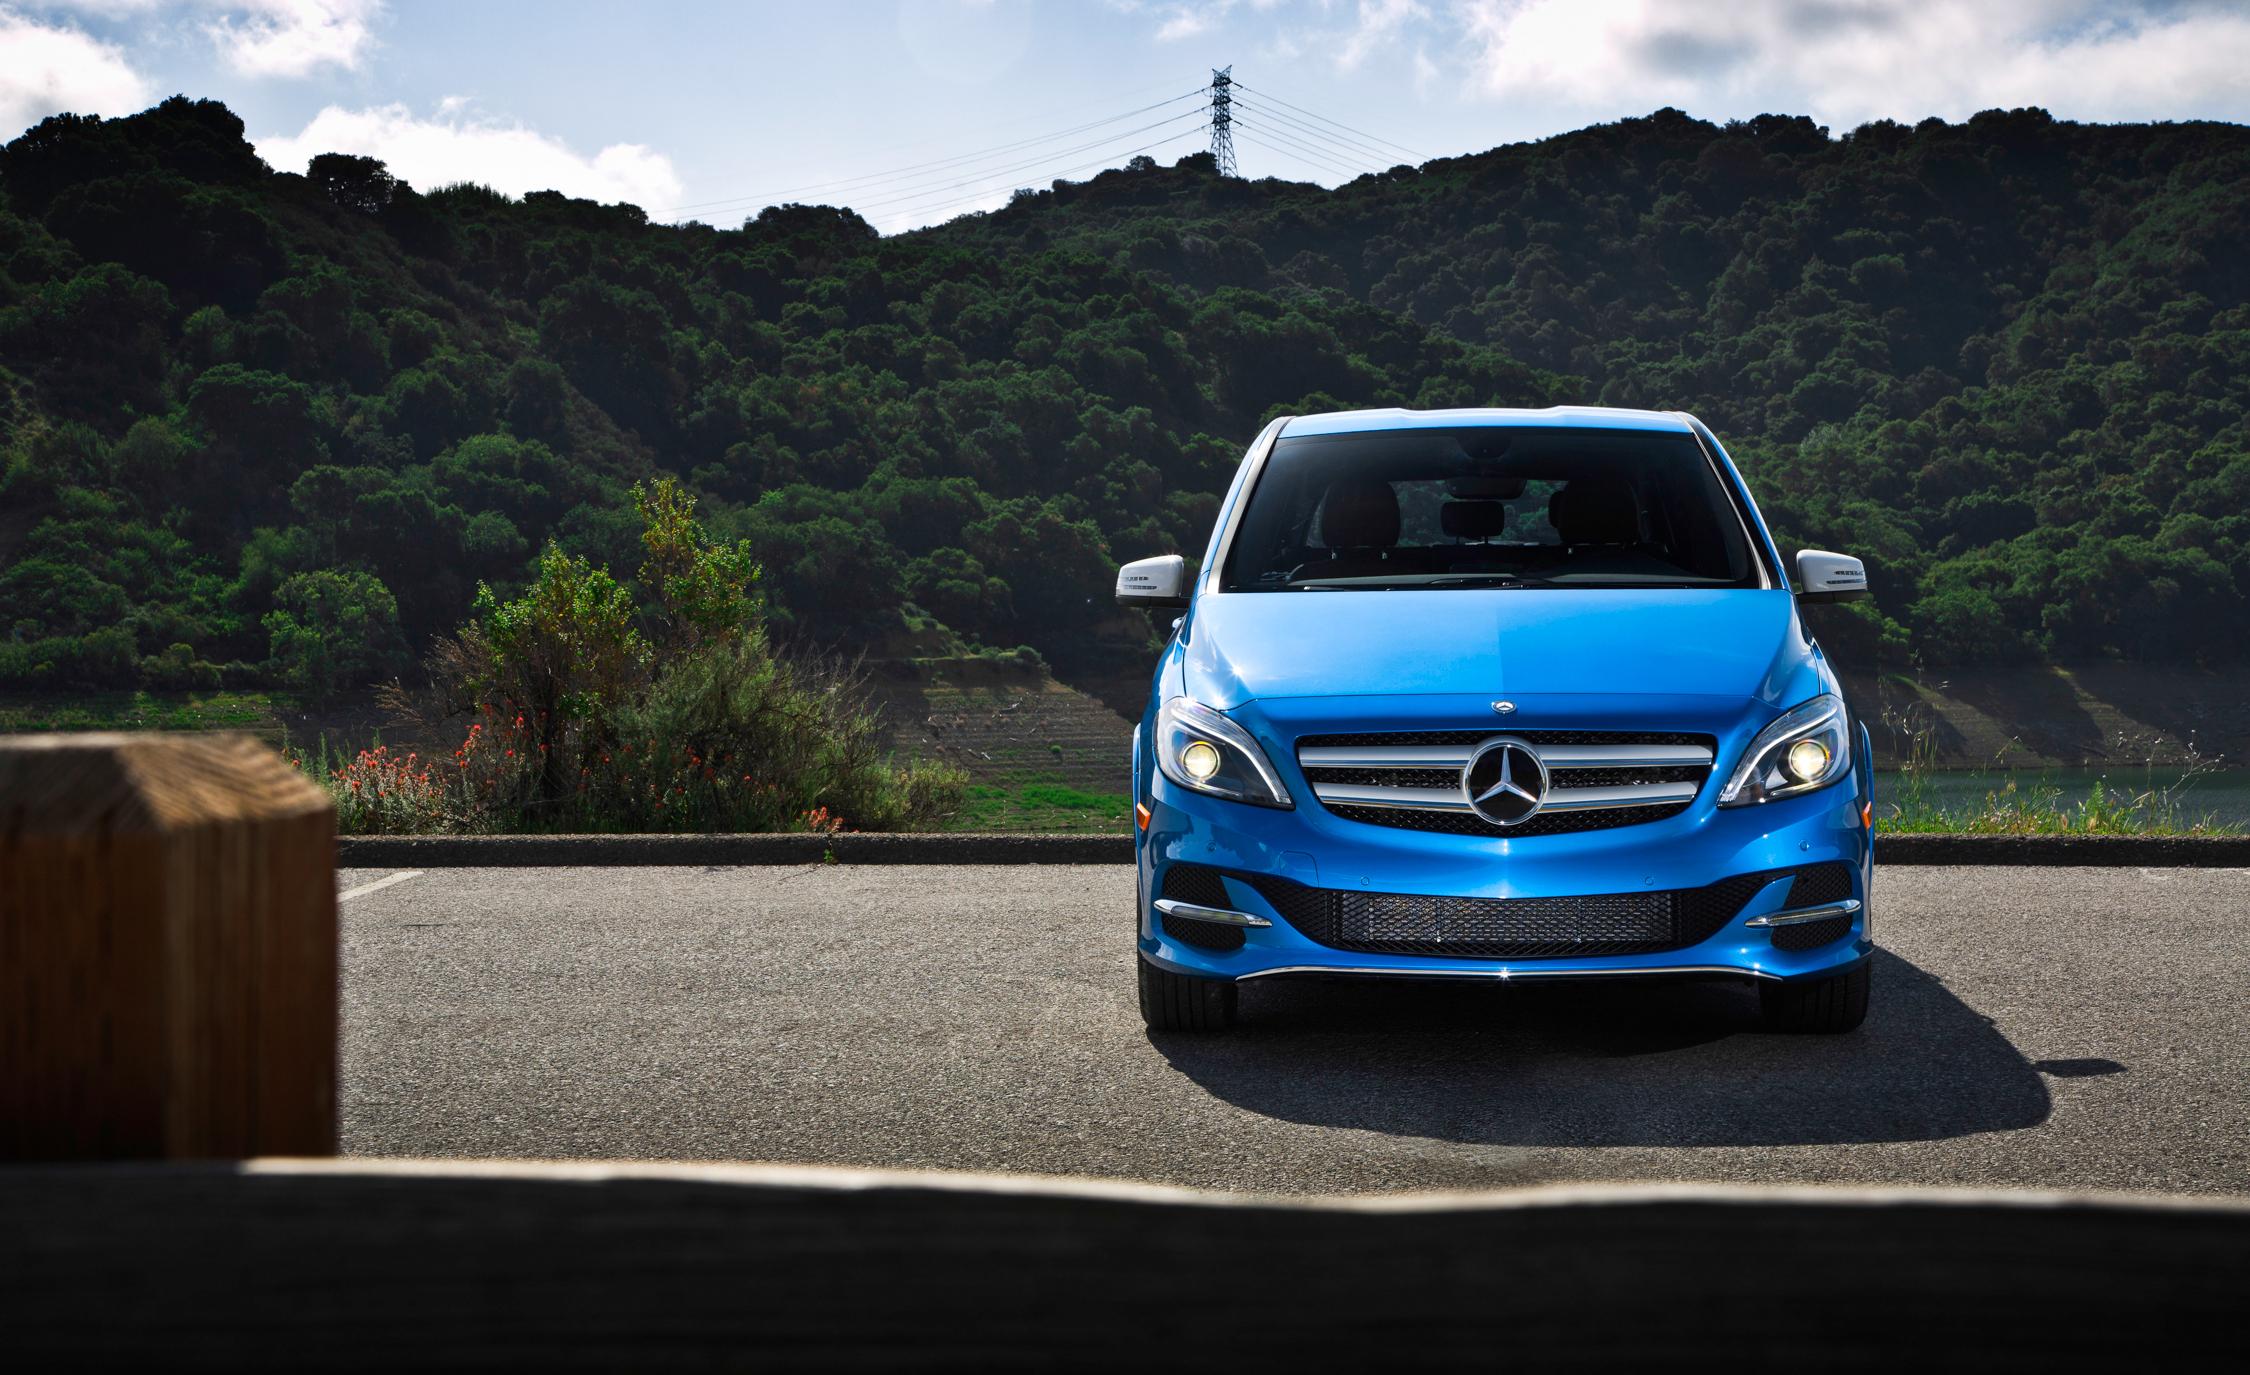 2014 Mercedes-Benz B-class Electric Drive Exterior Front End